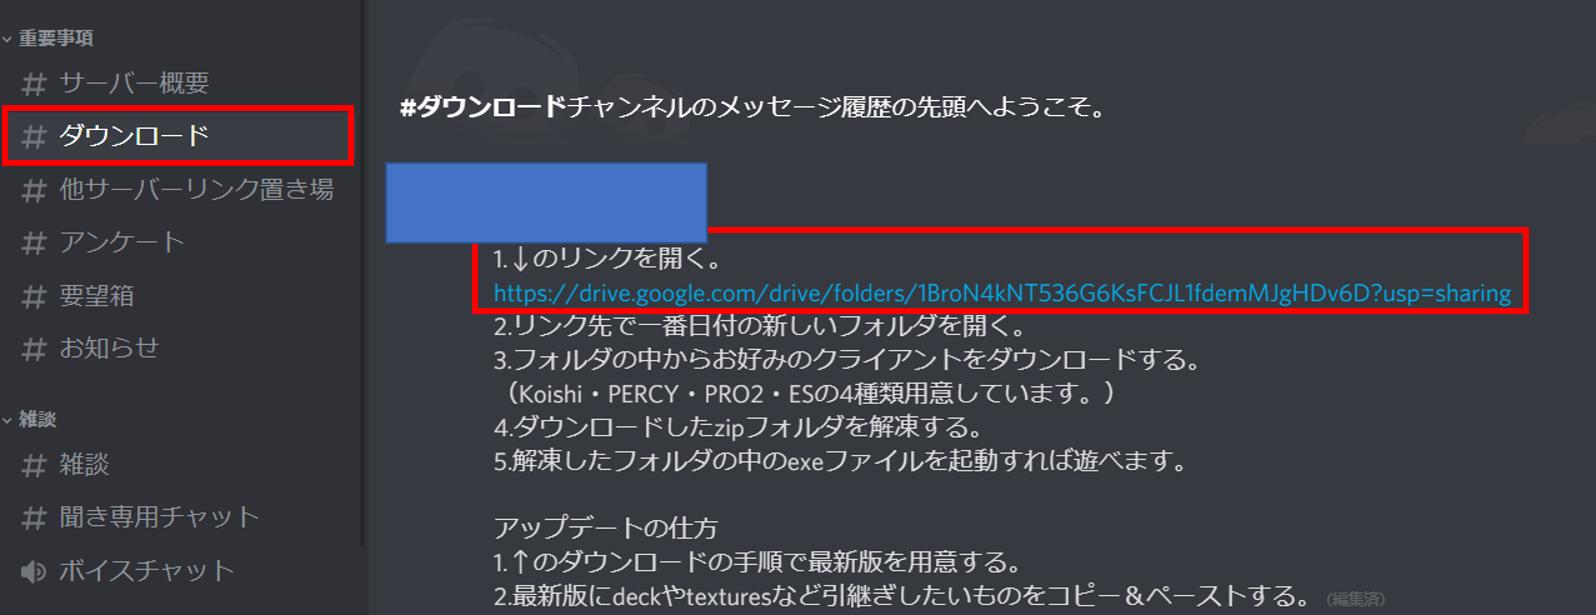 Ads 遊戯王